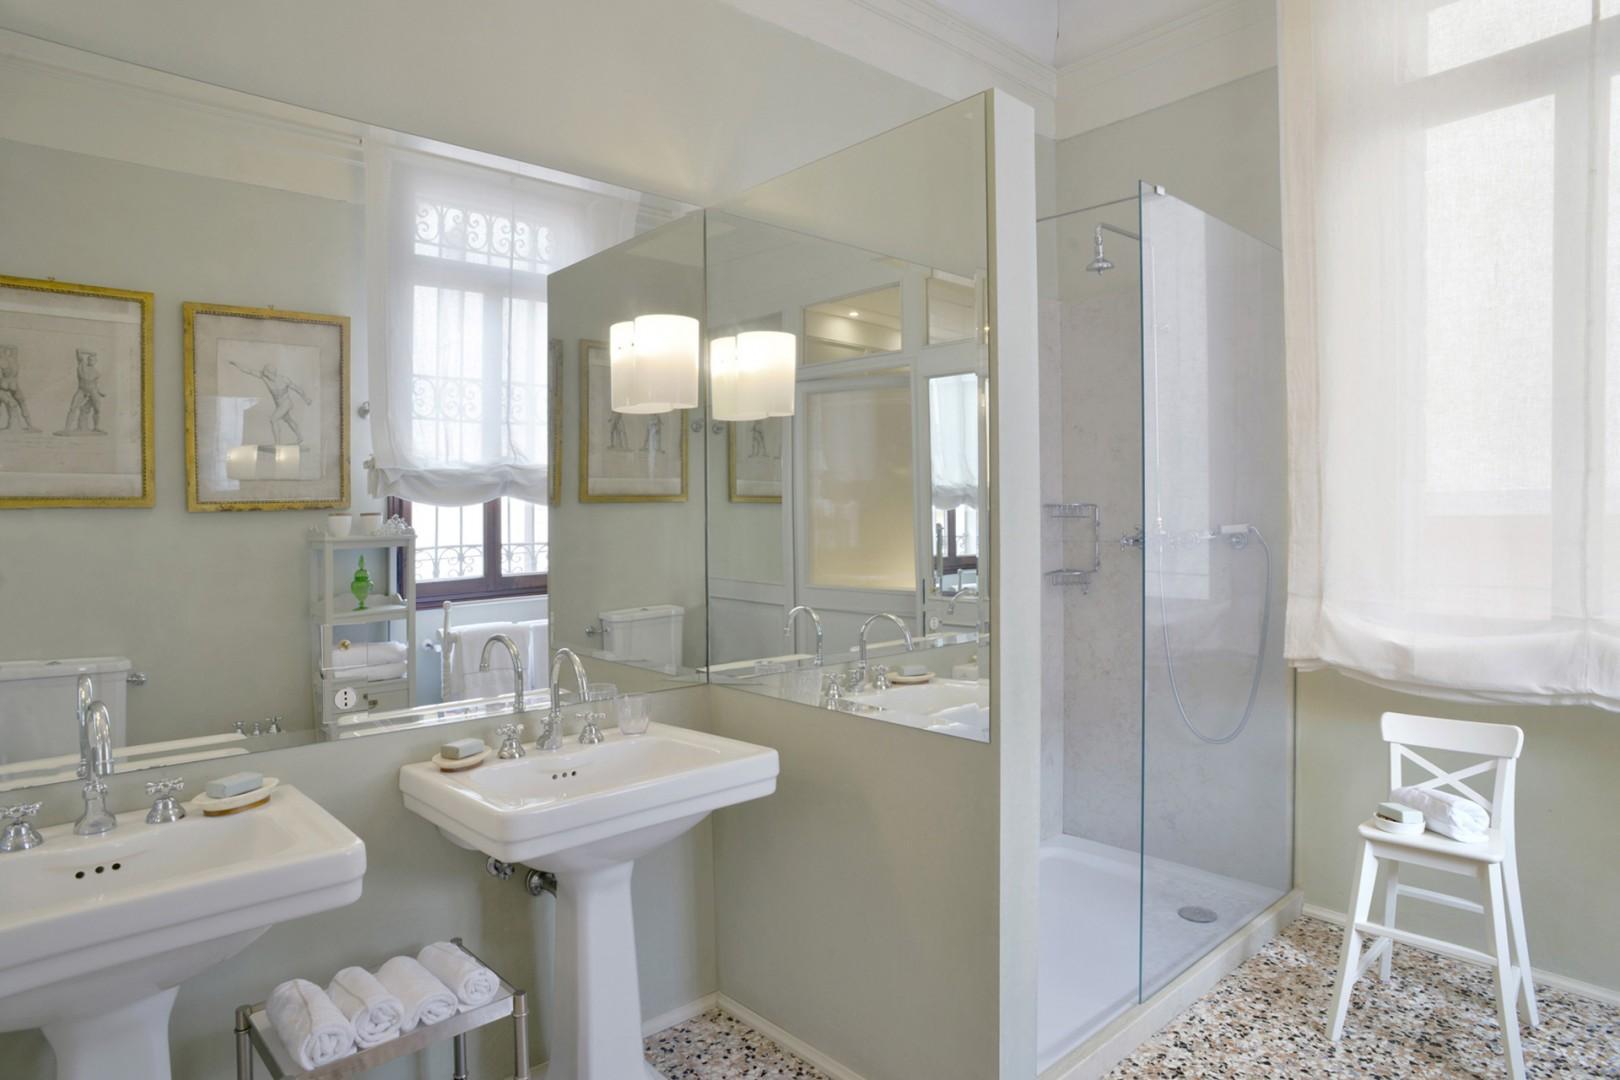 Bathroom 1 has a large shower.